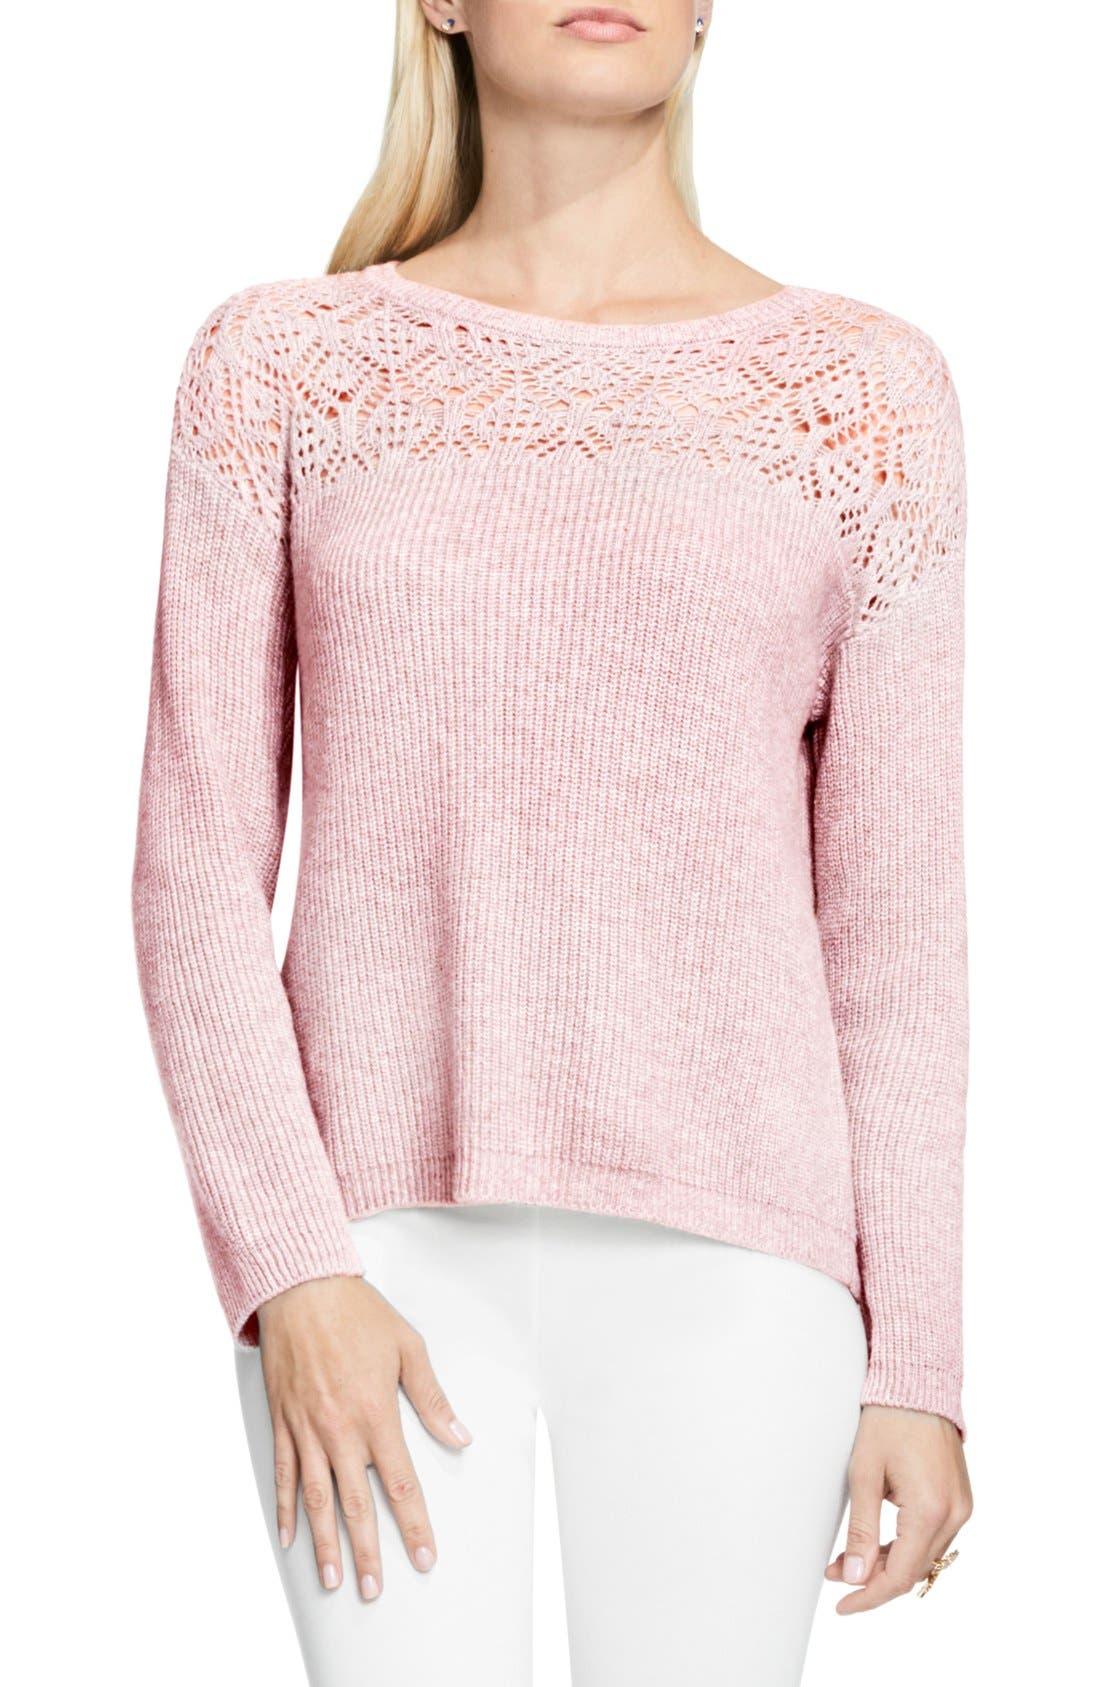 Alternate Image 1 Selected - Vince Camuto Pointelle Yoke Sweater (Regular & Petite)